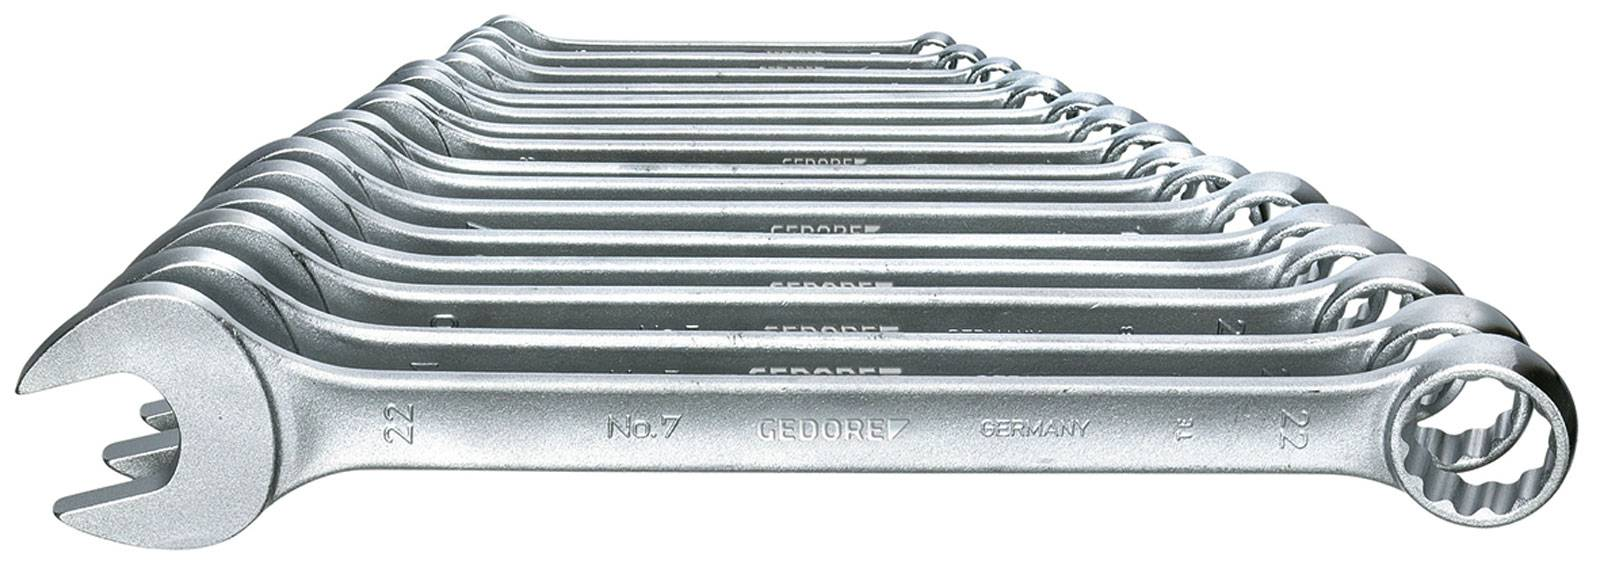 Sada očkoplochých kľúčov Gedore 6093580, 6 - 22 mm, 17-dielna